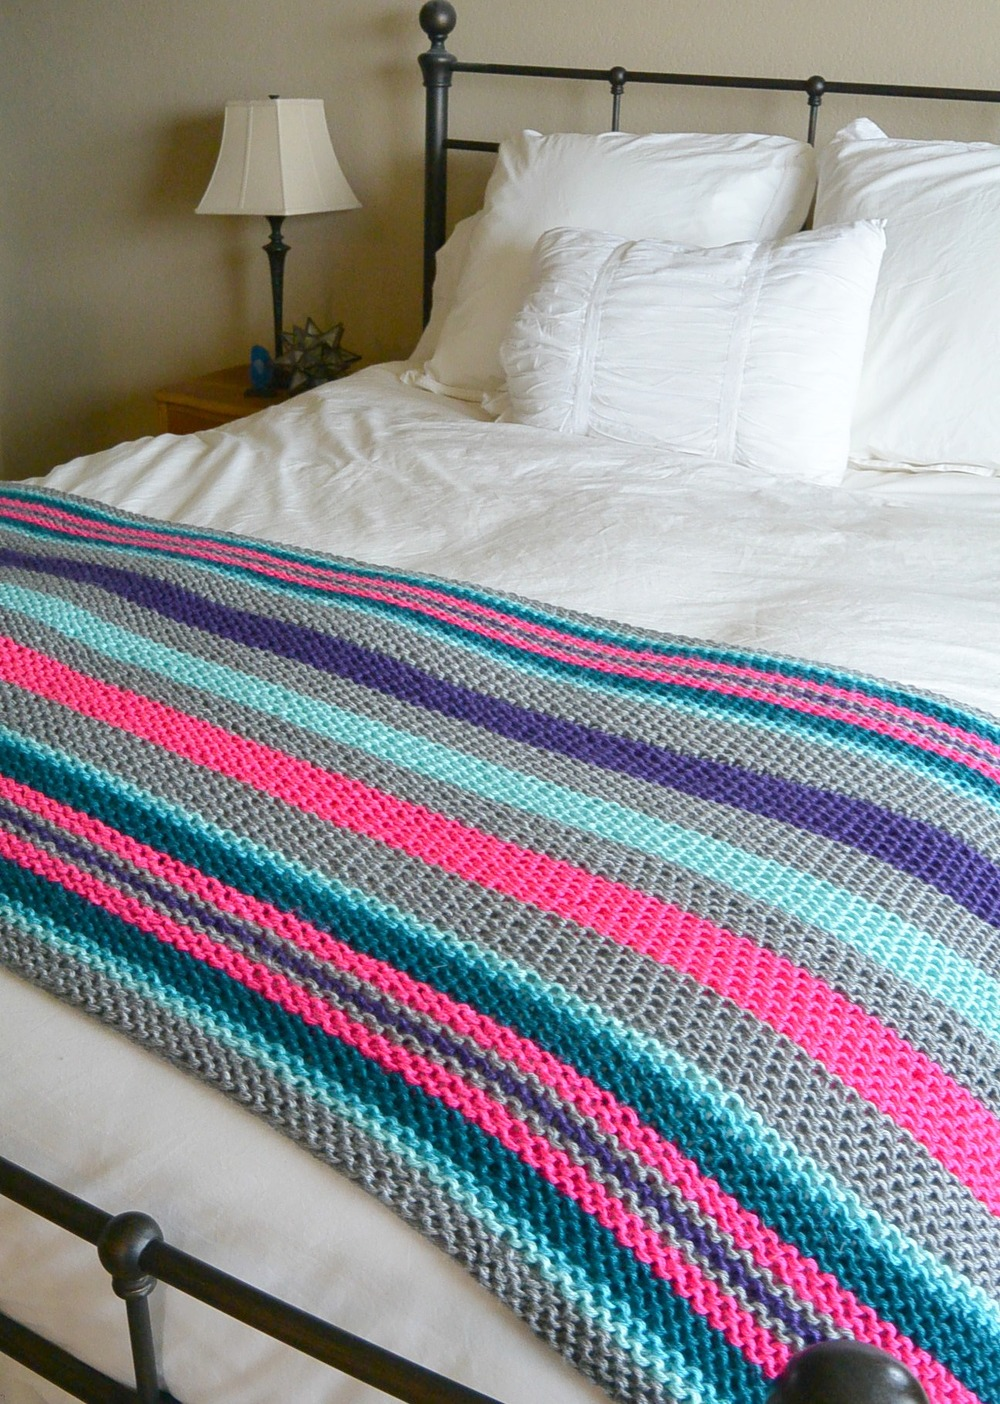 Native Stripes Knit Blanket Allfreeknitting Com